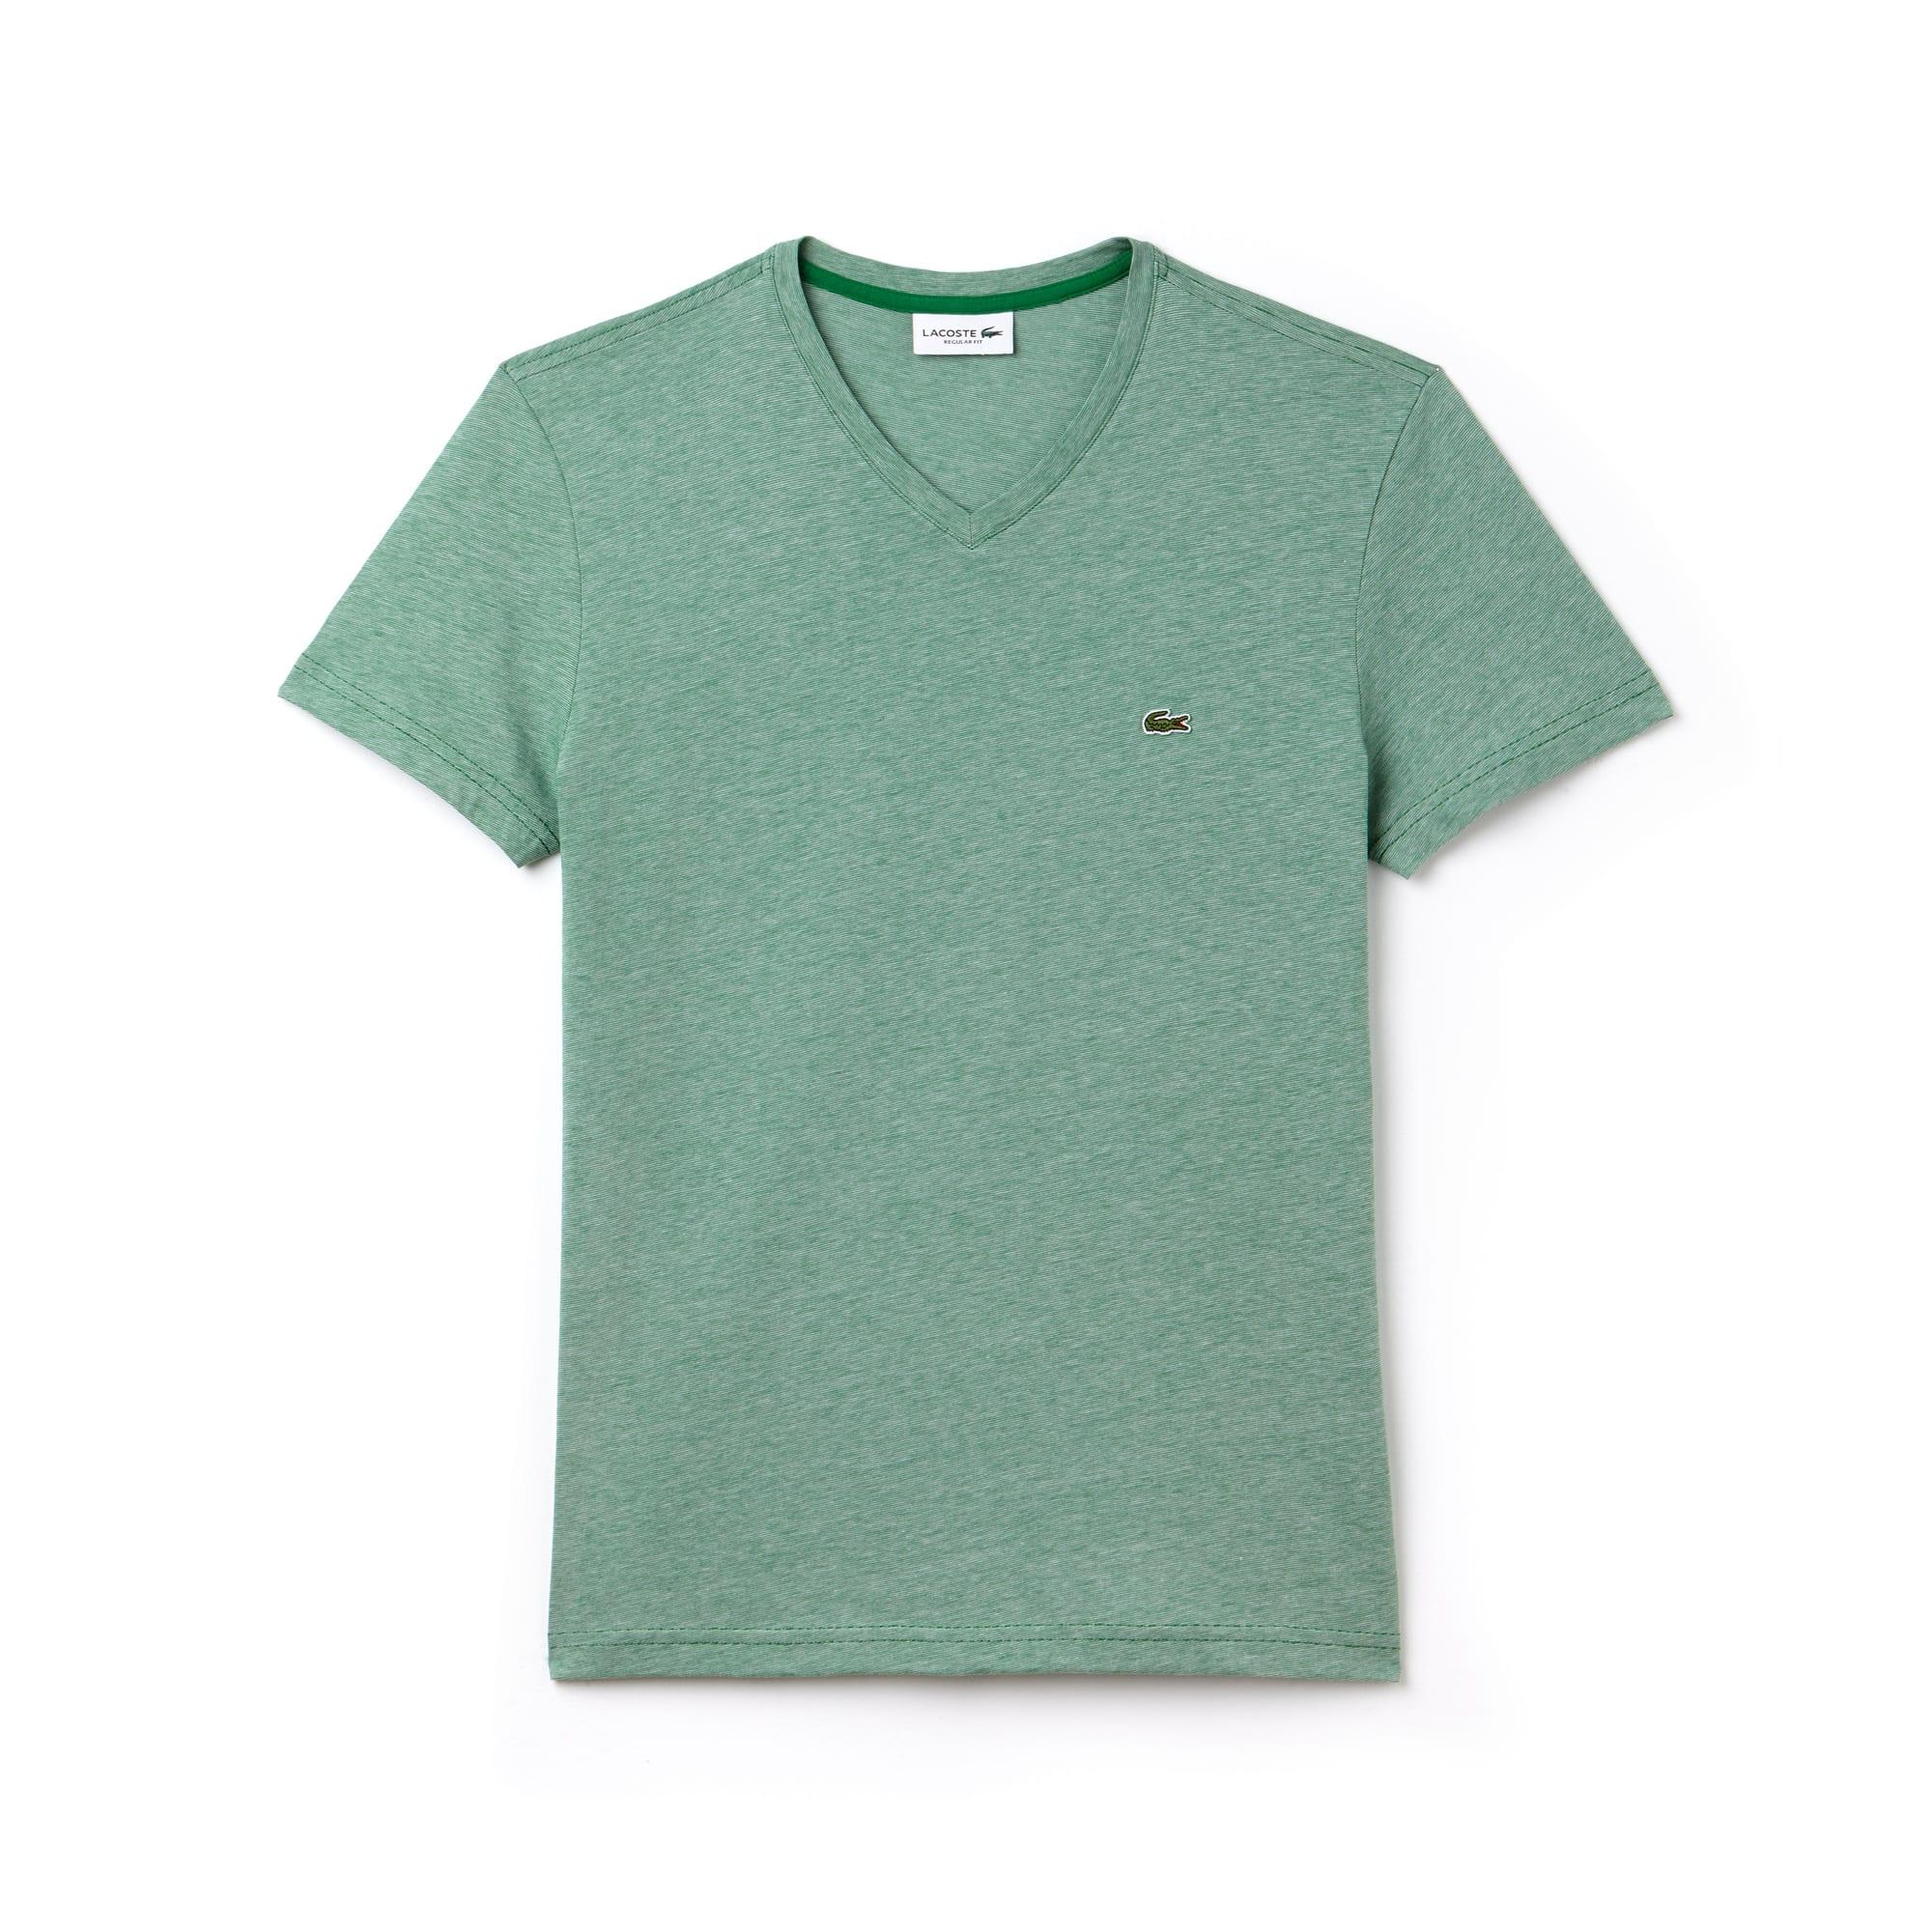 Men's V-Neck Pinstriped Cotton Jersey T-shirt